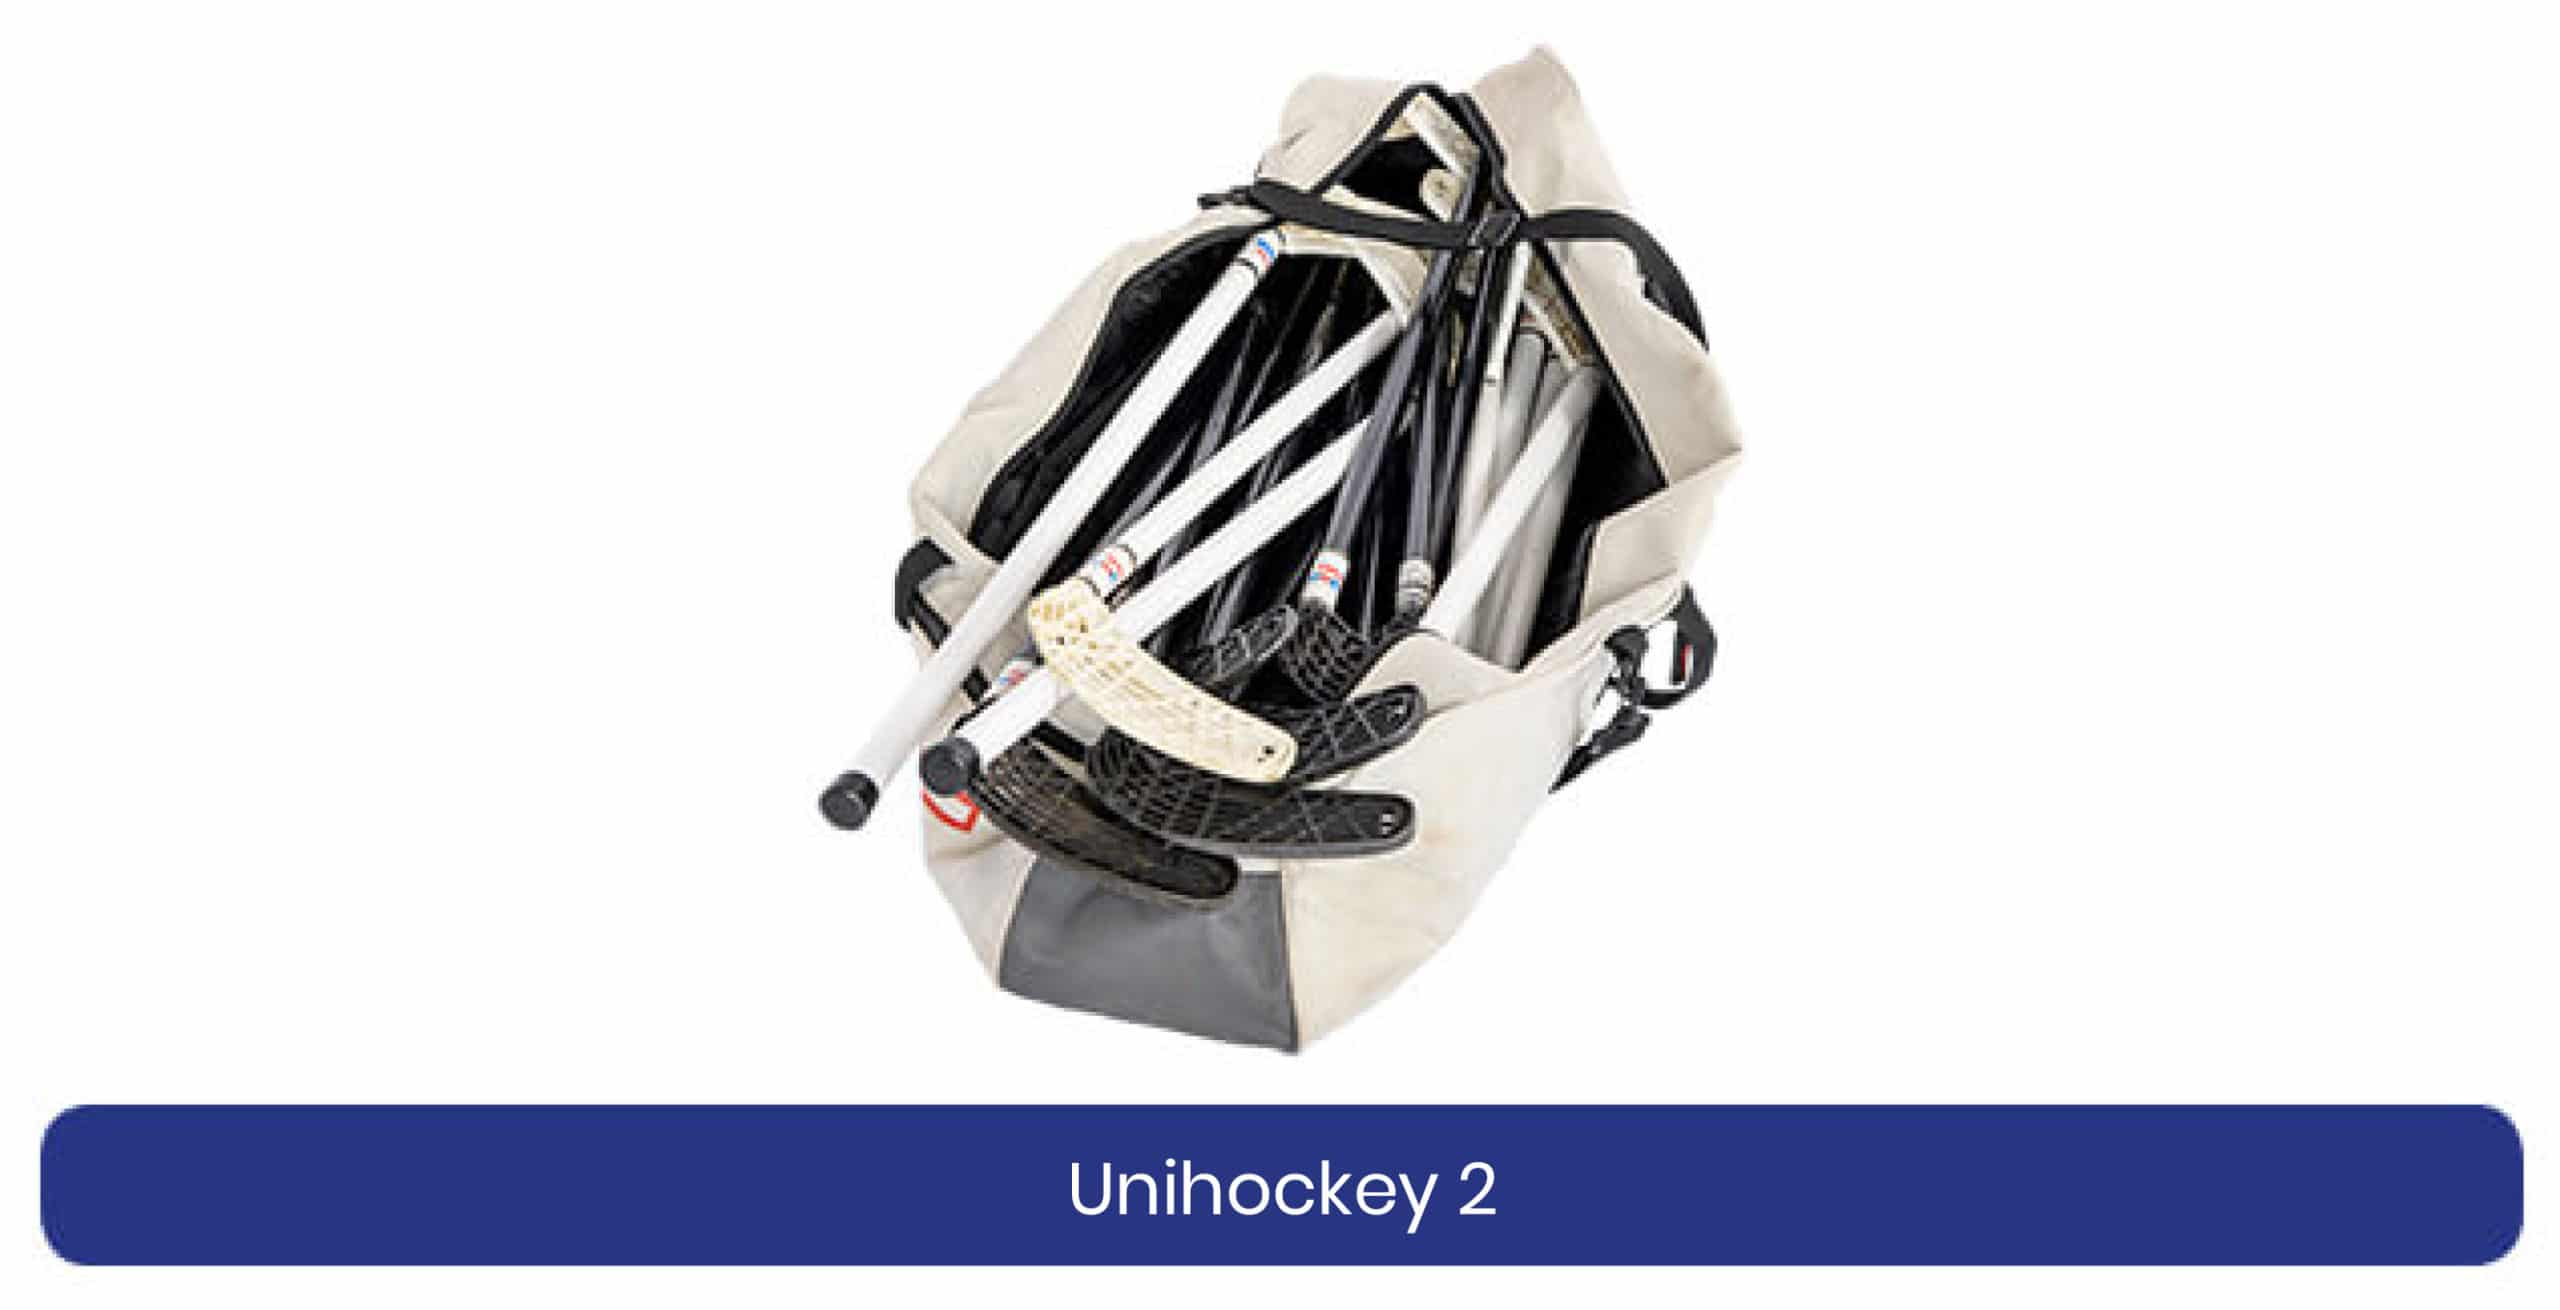 Unihockey 2 lenen product